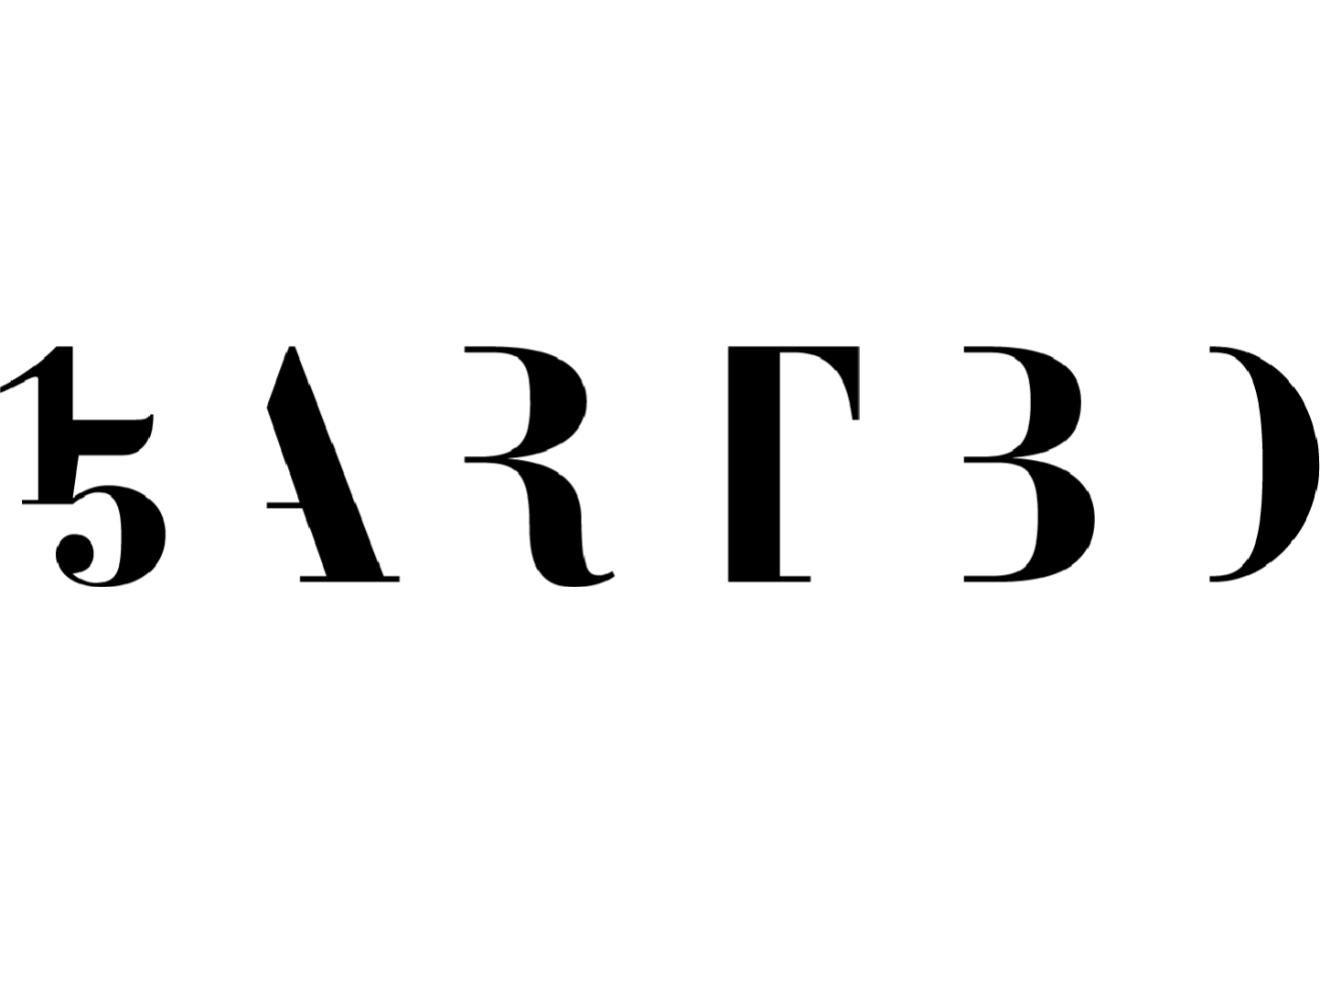 The official ARTBO logo for 2019